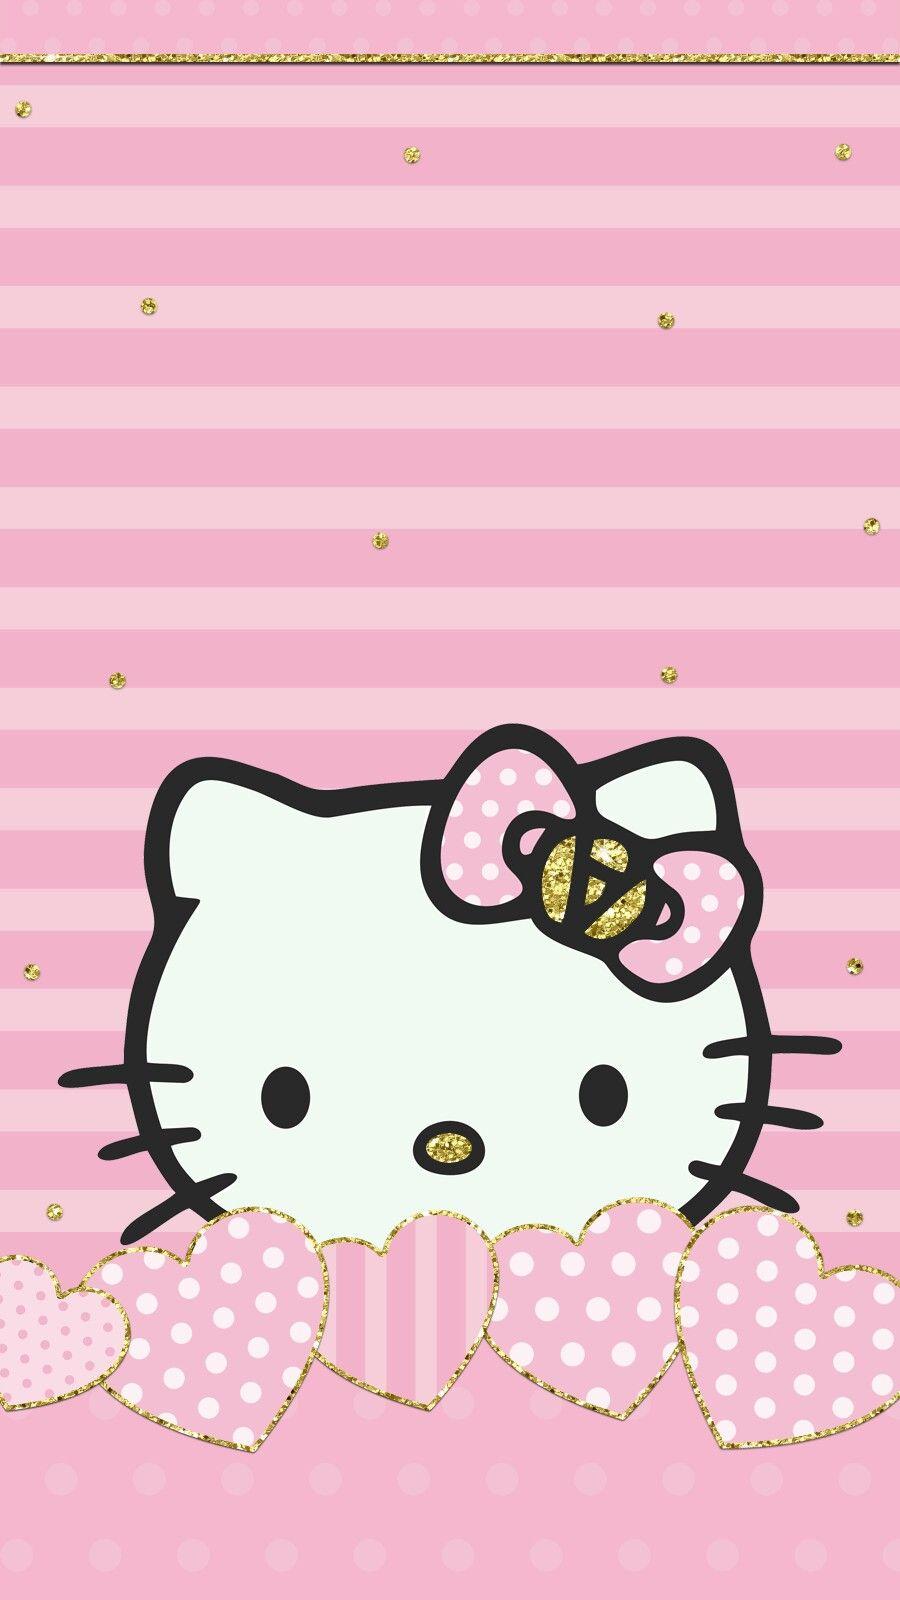 14 147653 download wallpaper hello kitty bergerak untuk hp hello